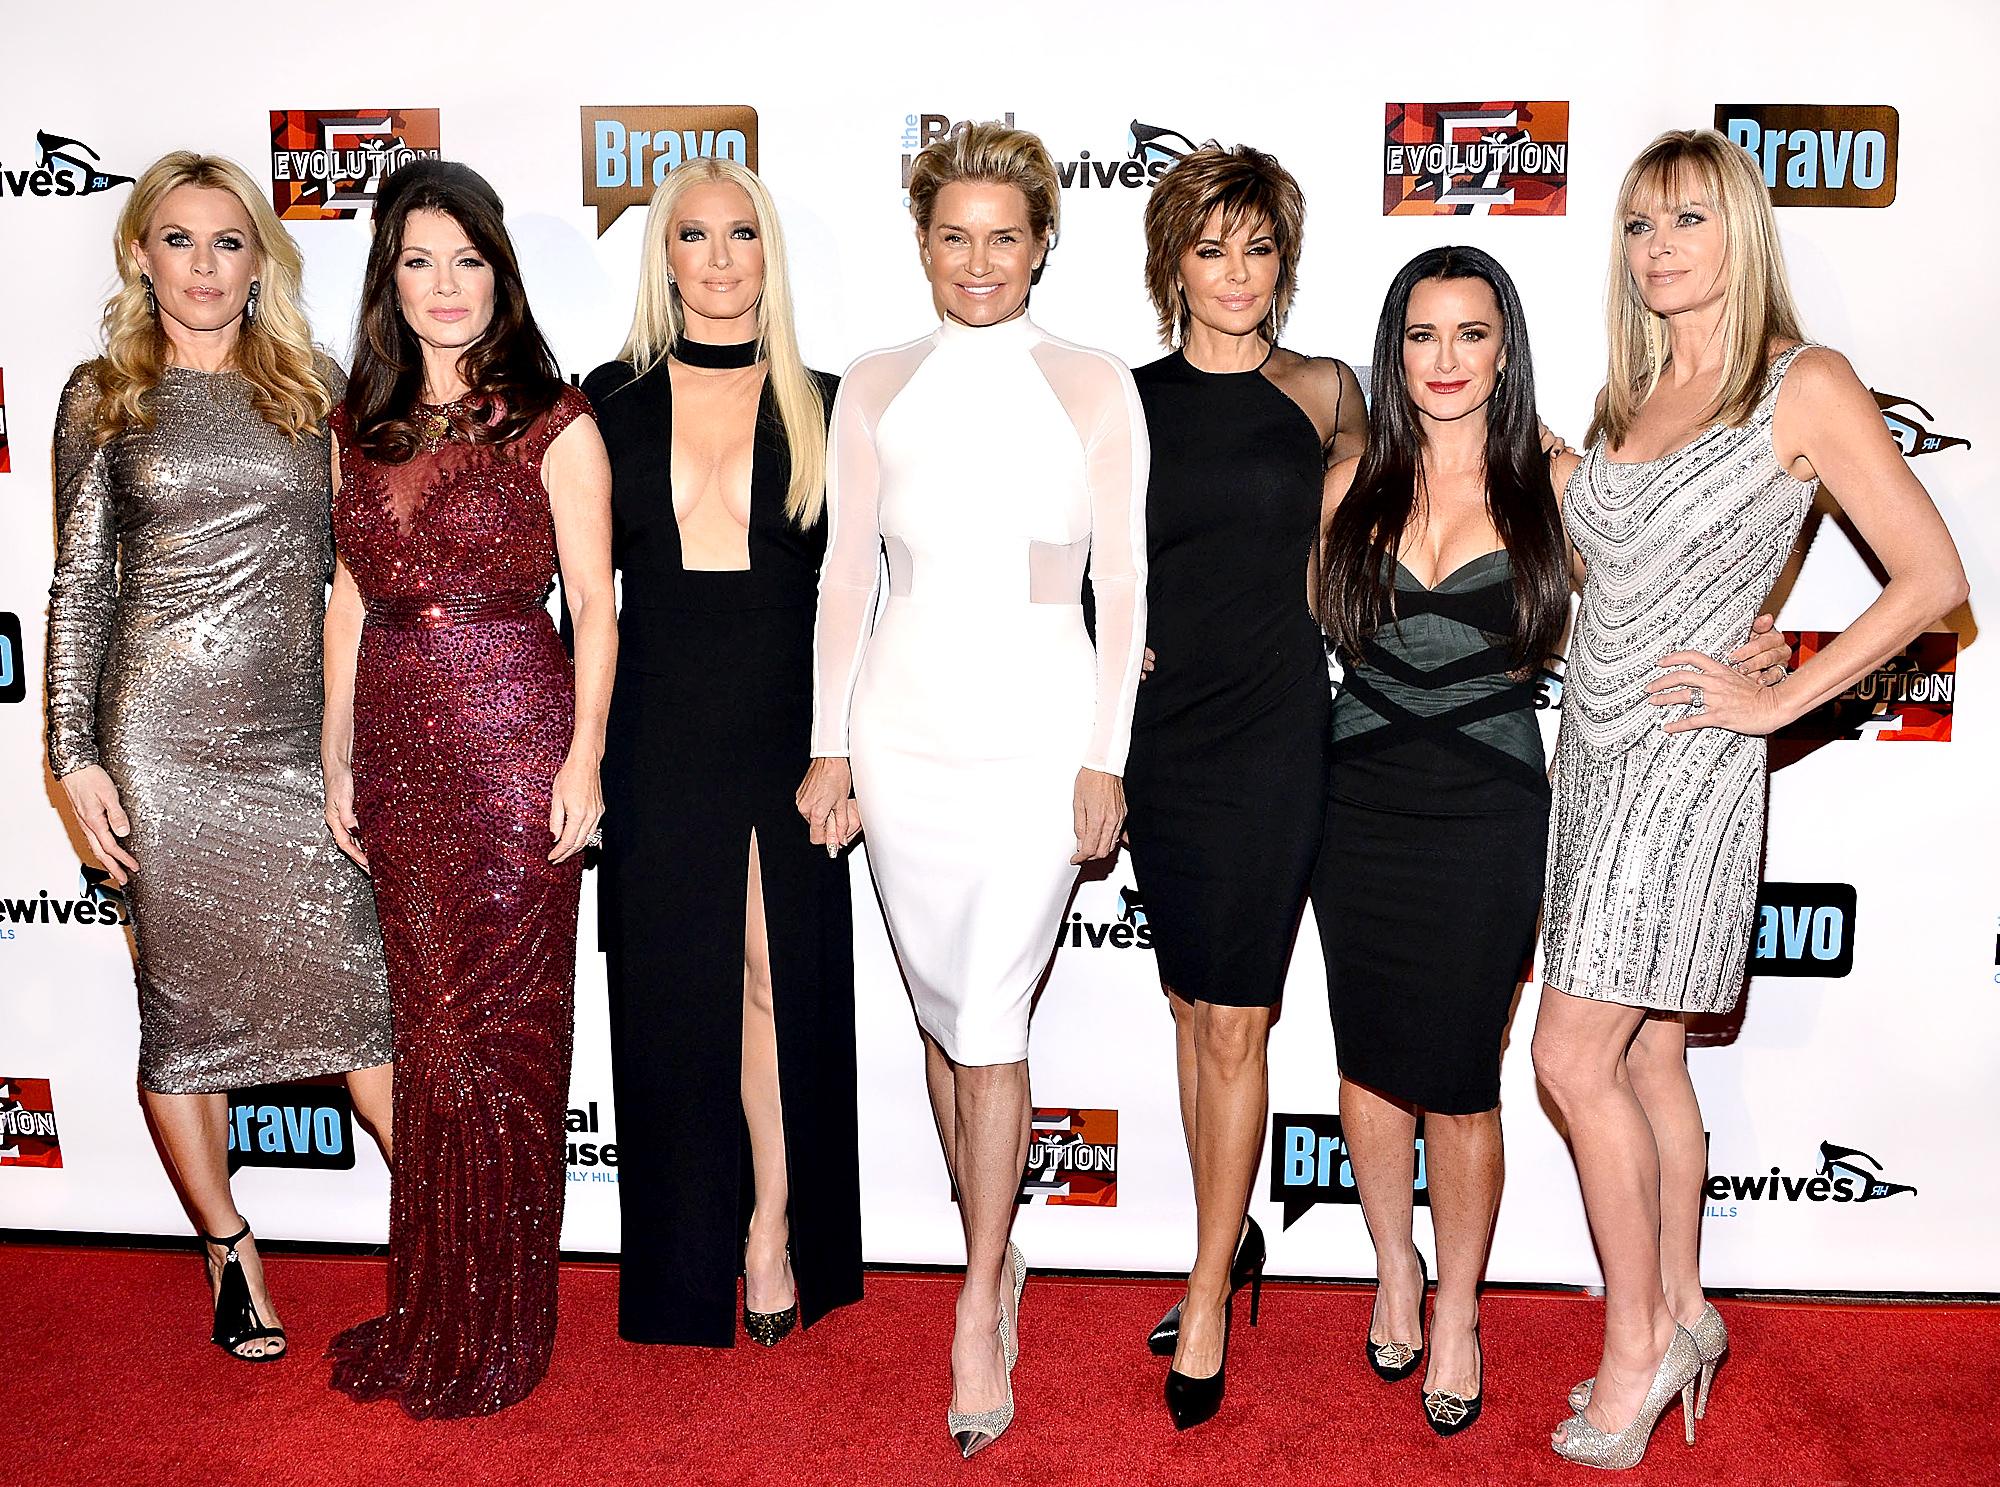 Kathryn Edwards, Lisa Vanderpump, Erika Girardi, Yolanda Foster, Lisa Rinna, Kyle Richards and Eileen Davidson attend the premiere party for Bravo's